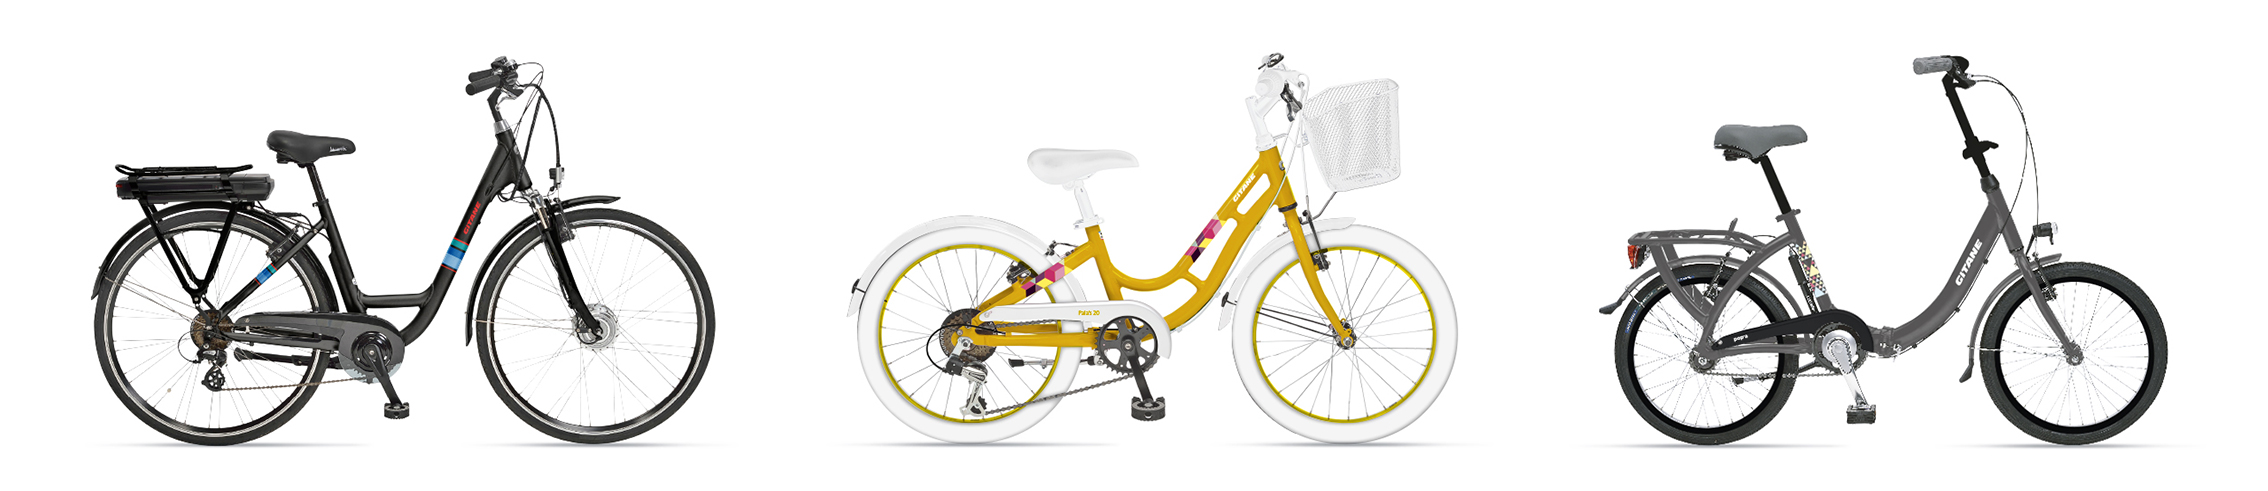 gitane sigle G vélo identité logo